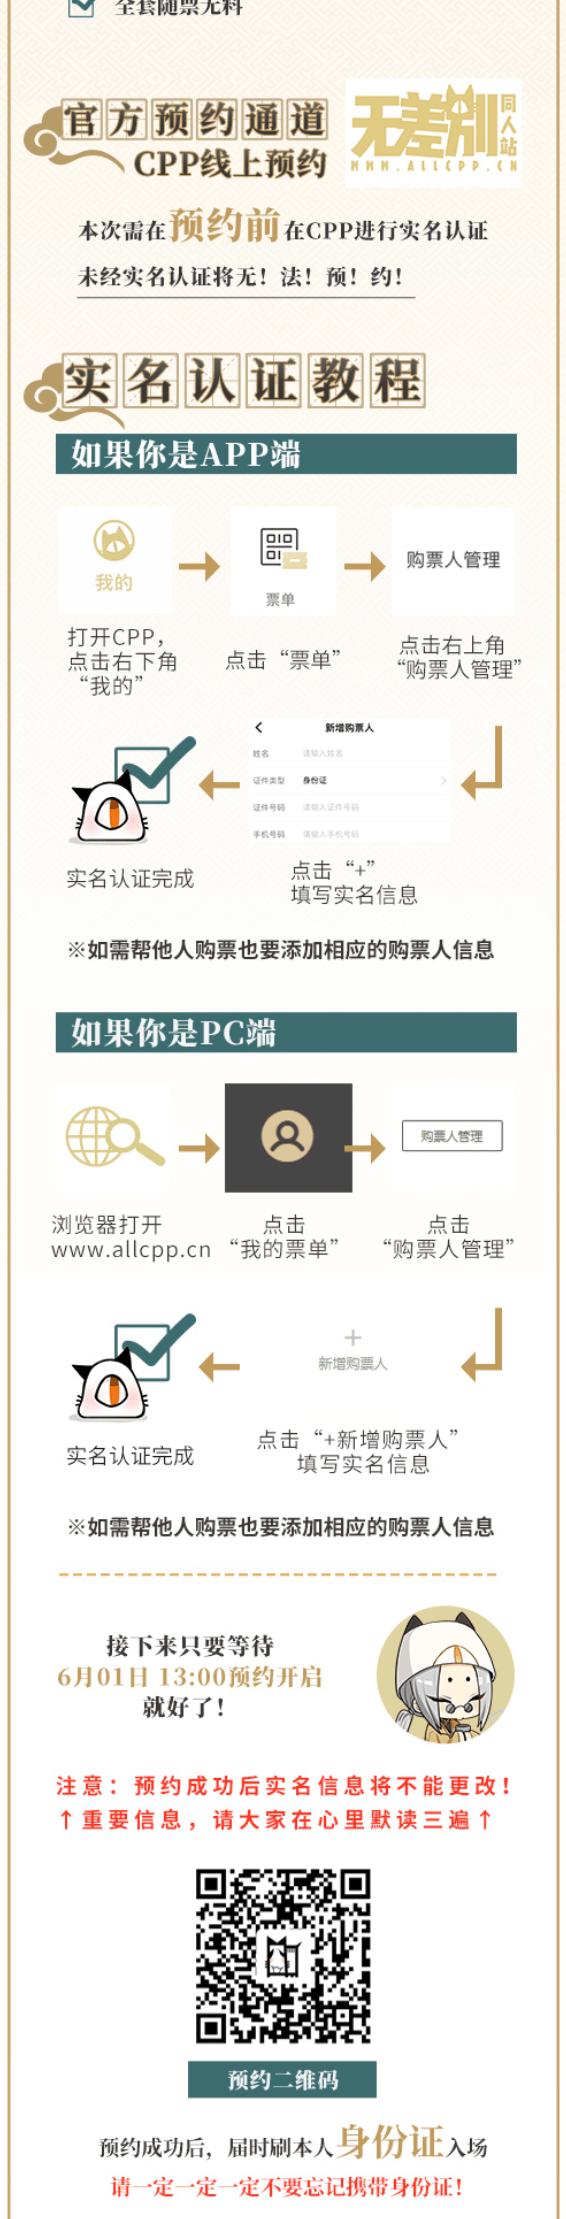 【CP28】明天下午(6月1日)一点 !第一波门票预约开启!CPP独家VIP票,限量上架~-C3动漫网